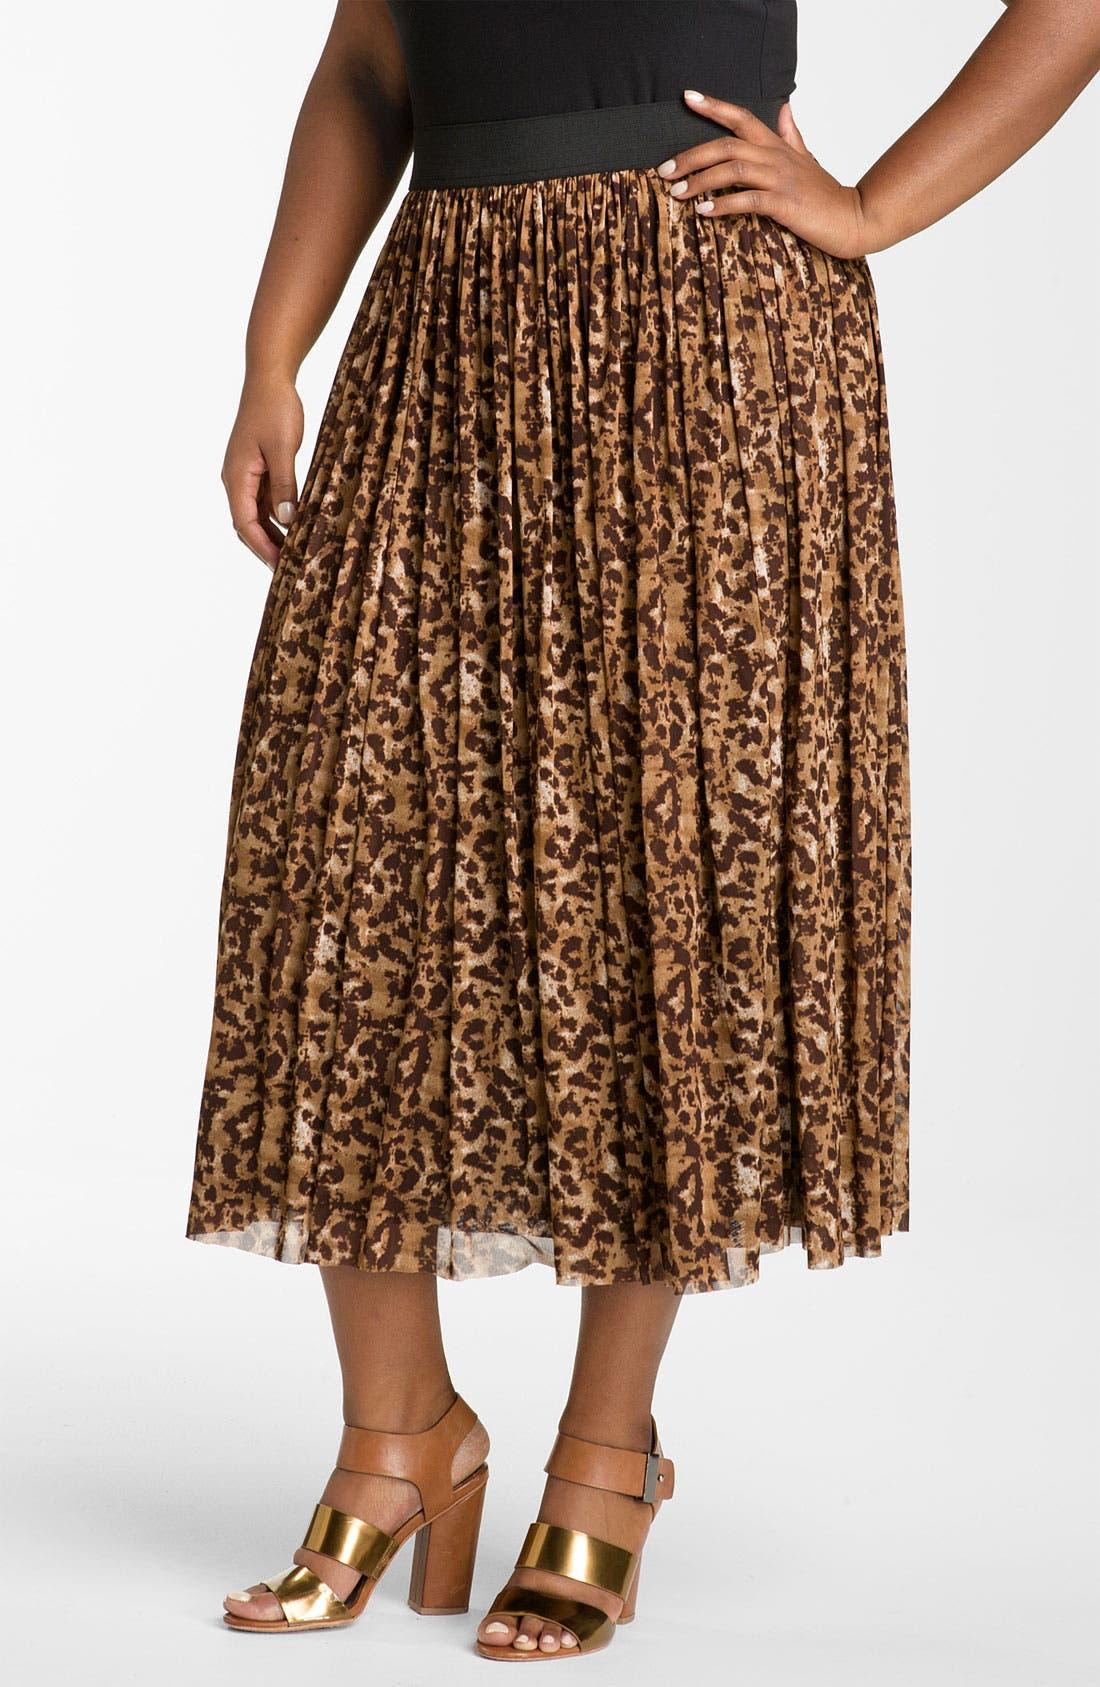 Alternate Image 1 Selected - Vince Camuto 'Textured Spots' Animal Print Skirt (Plus)